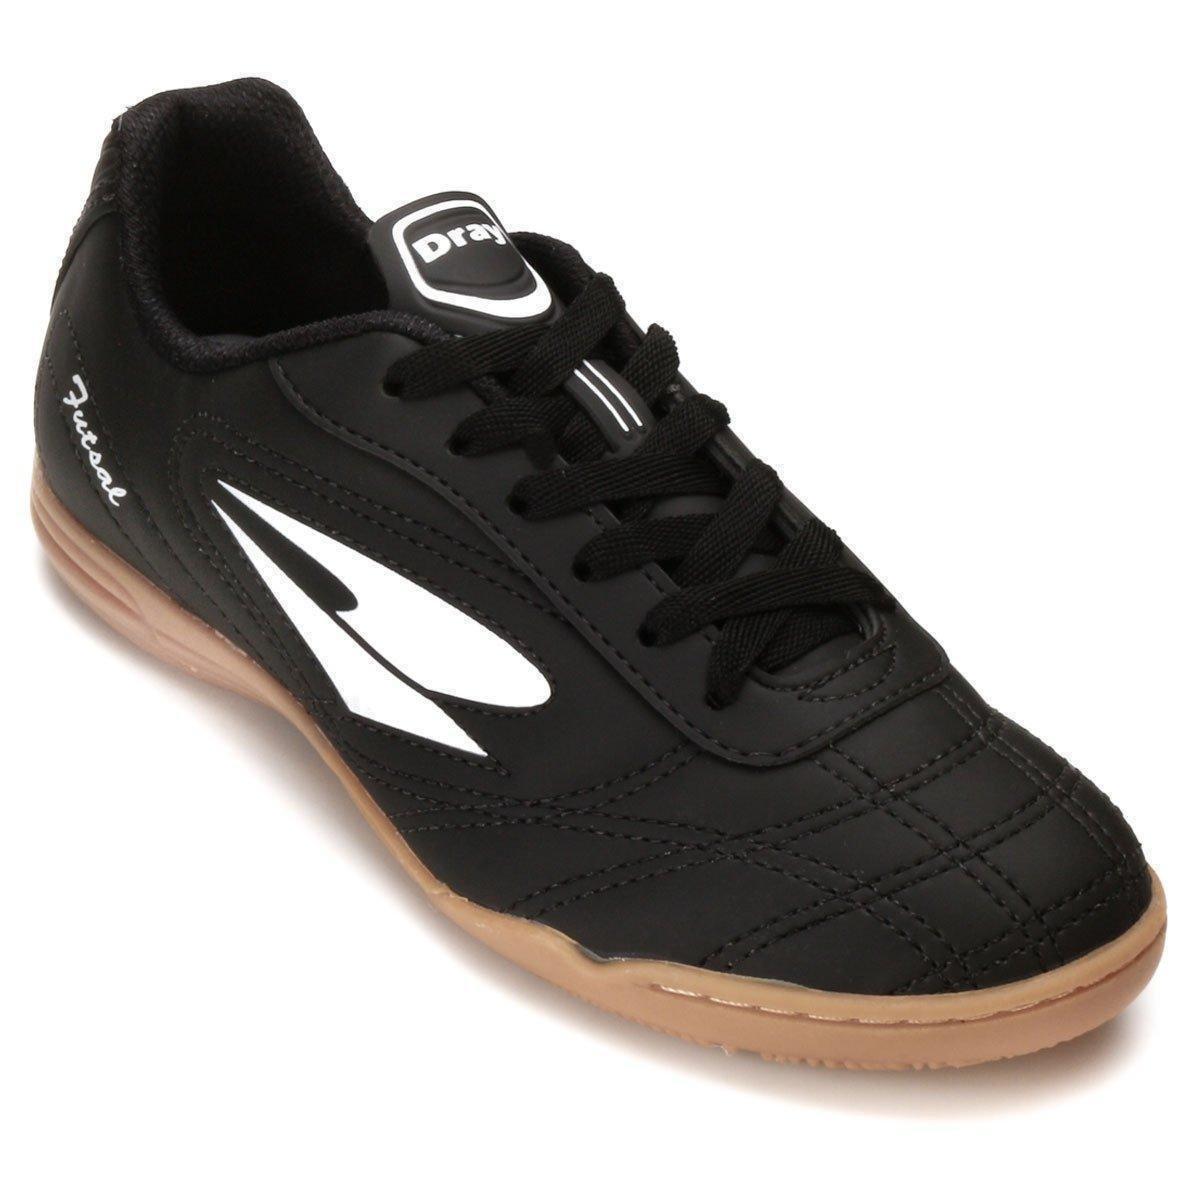 Tênis Tênis 802 Futsal Dray 802 CO Preto Branco Dray Futsal CO e 6qwnAgH